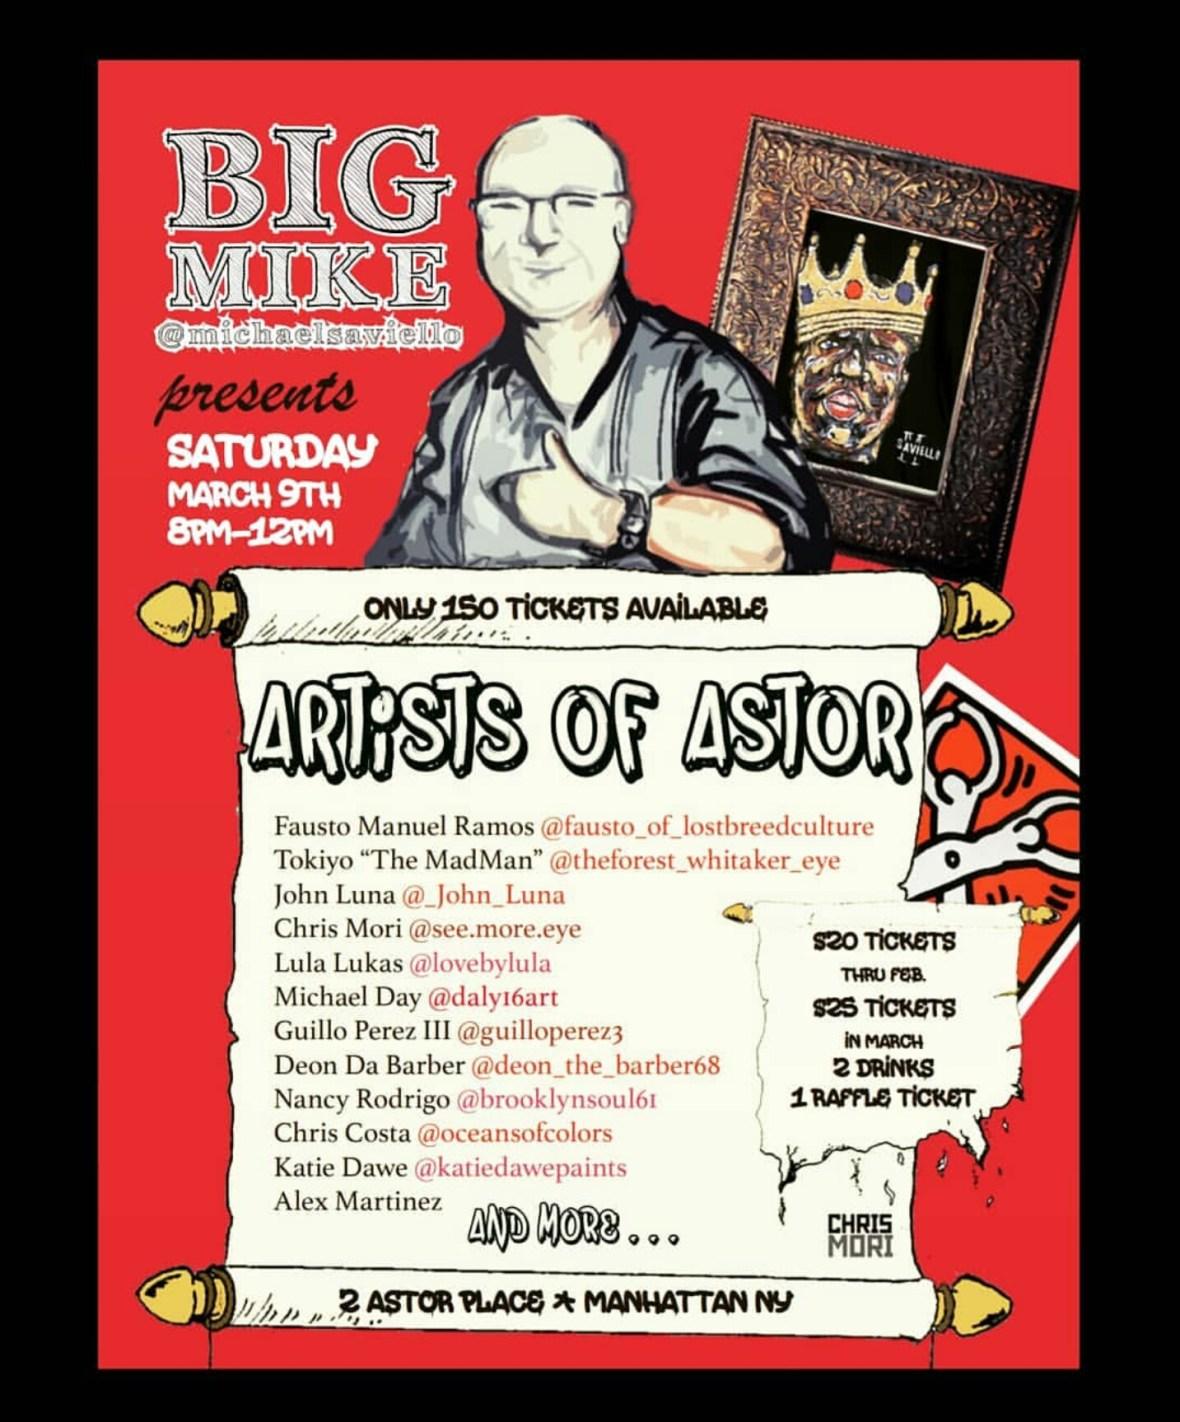 Artists Of Astor Poster